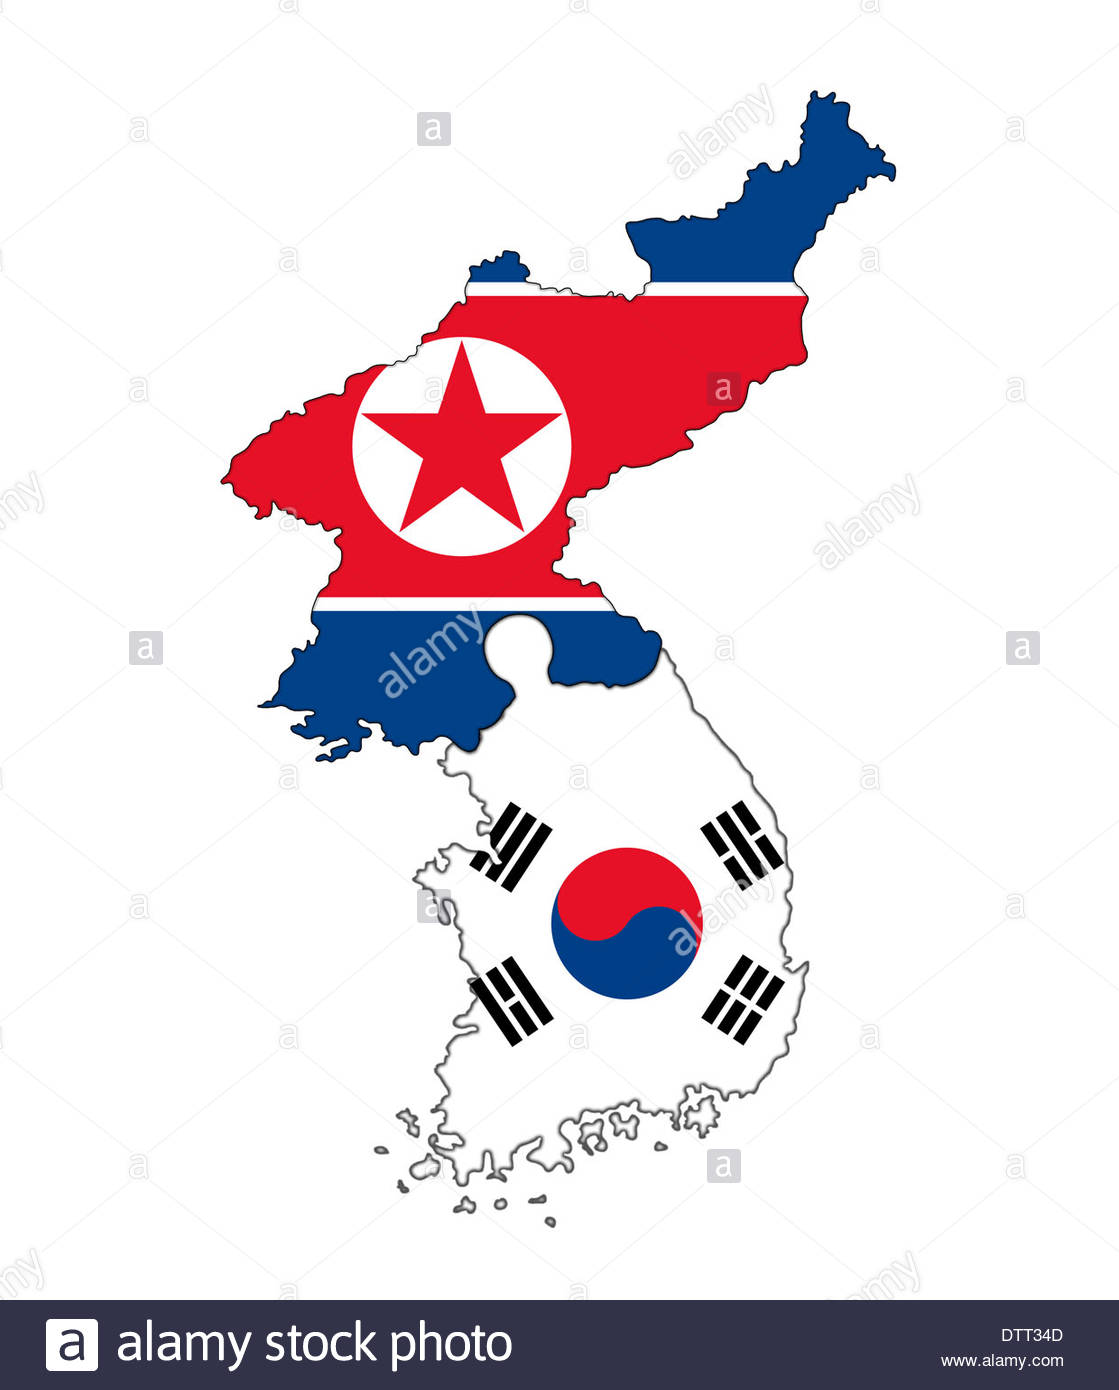 North Korea South Korea Map Stockfotos & North Korea South Korea Map ...